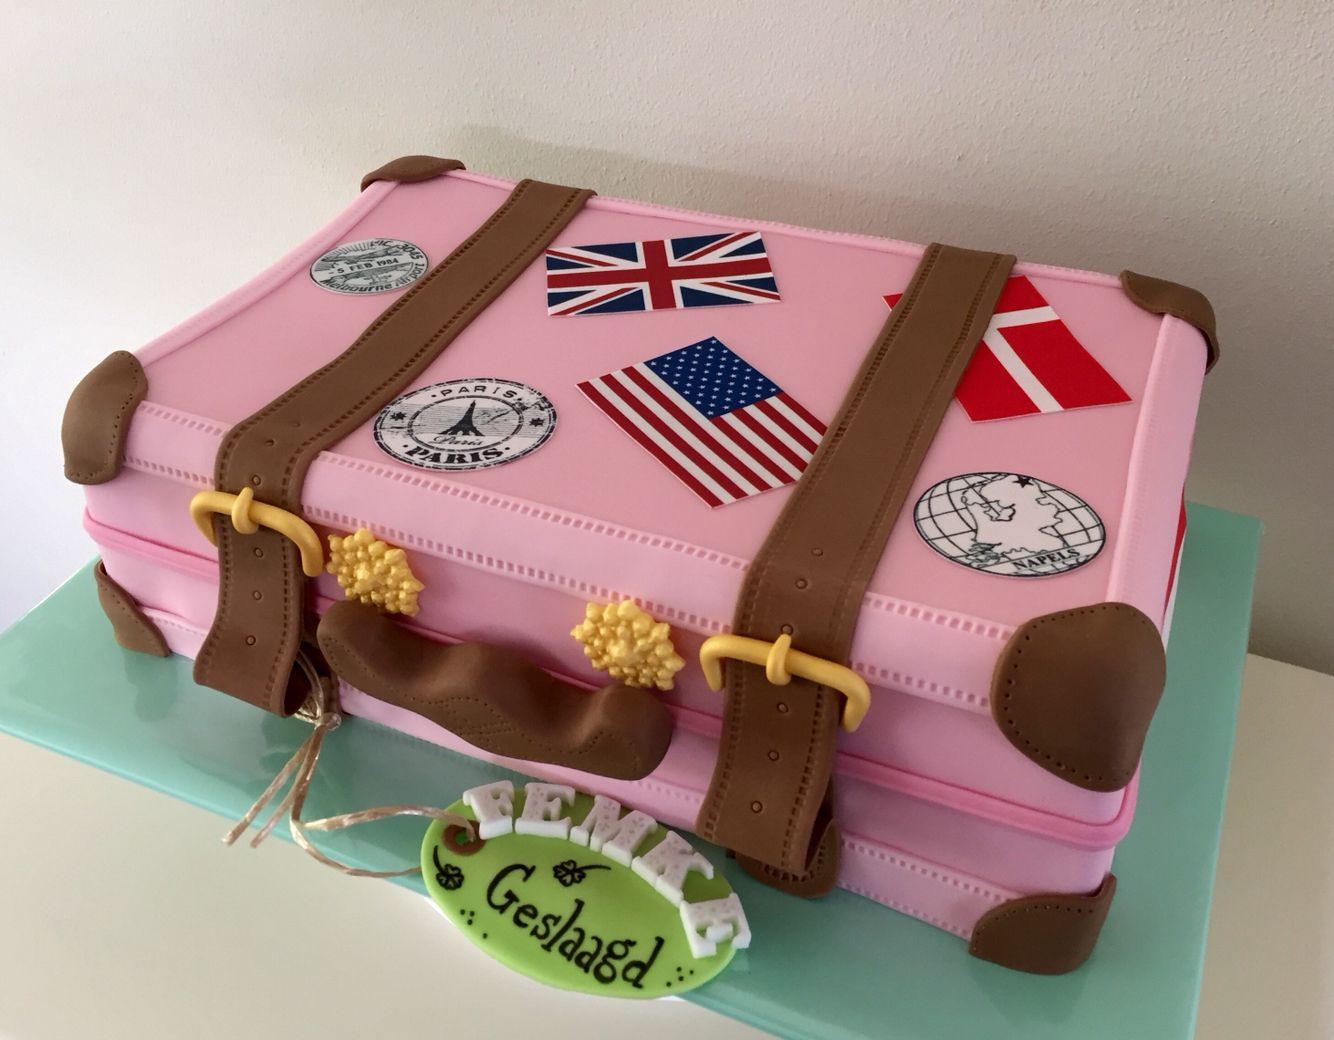 taart koffer Koffer taart door Sylvie Vencken | Cupcakes en taartjes | Pinterest taart koffer